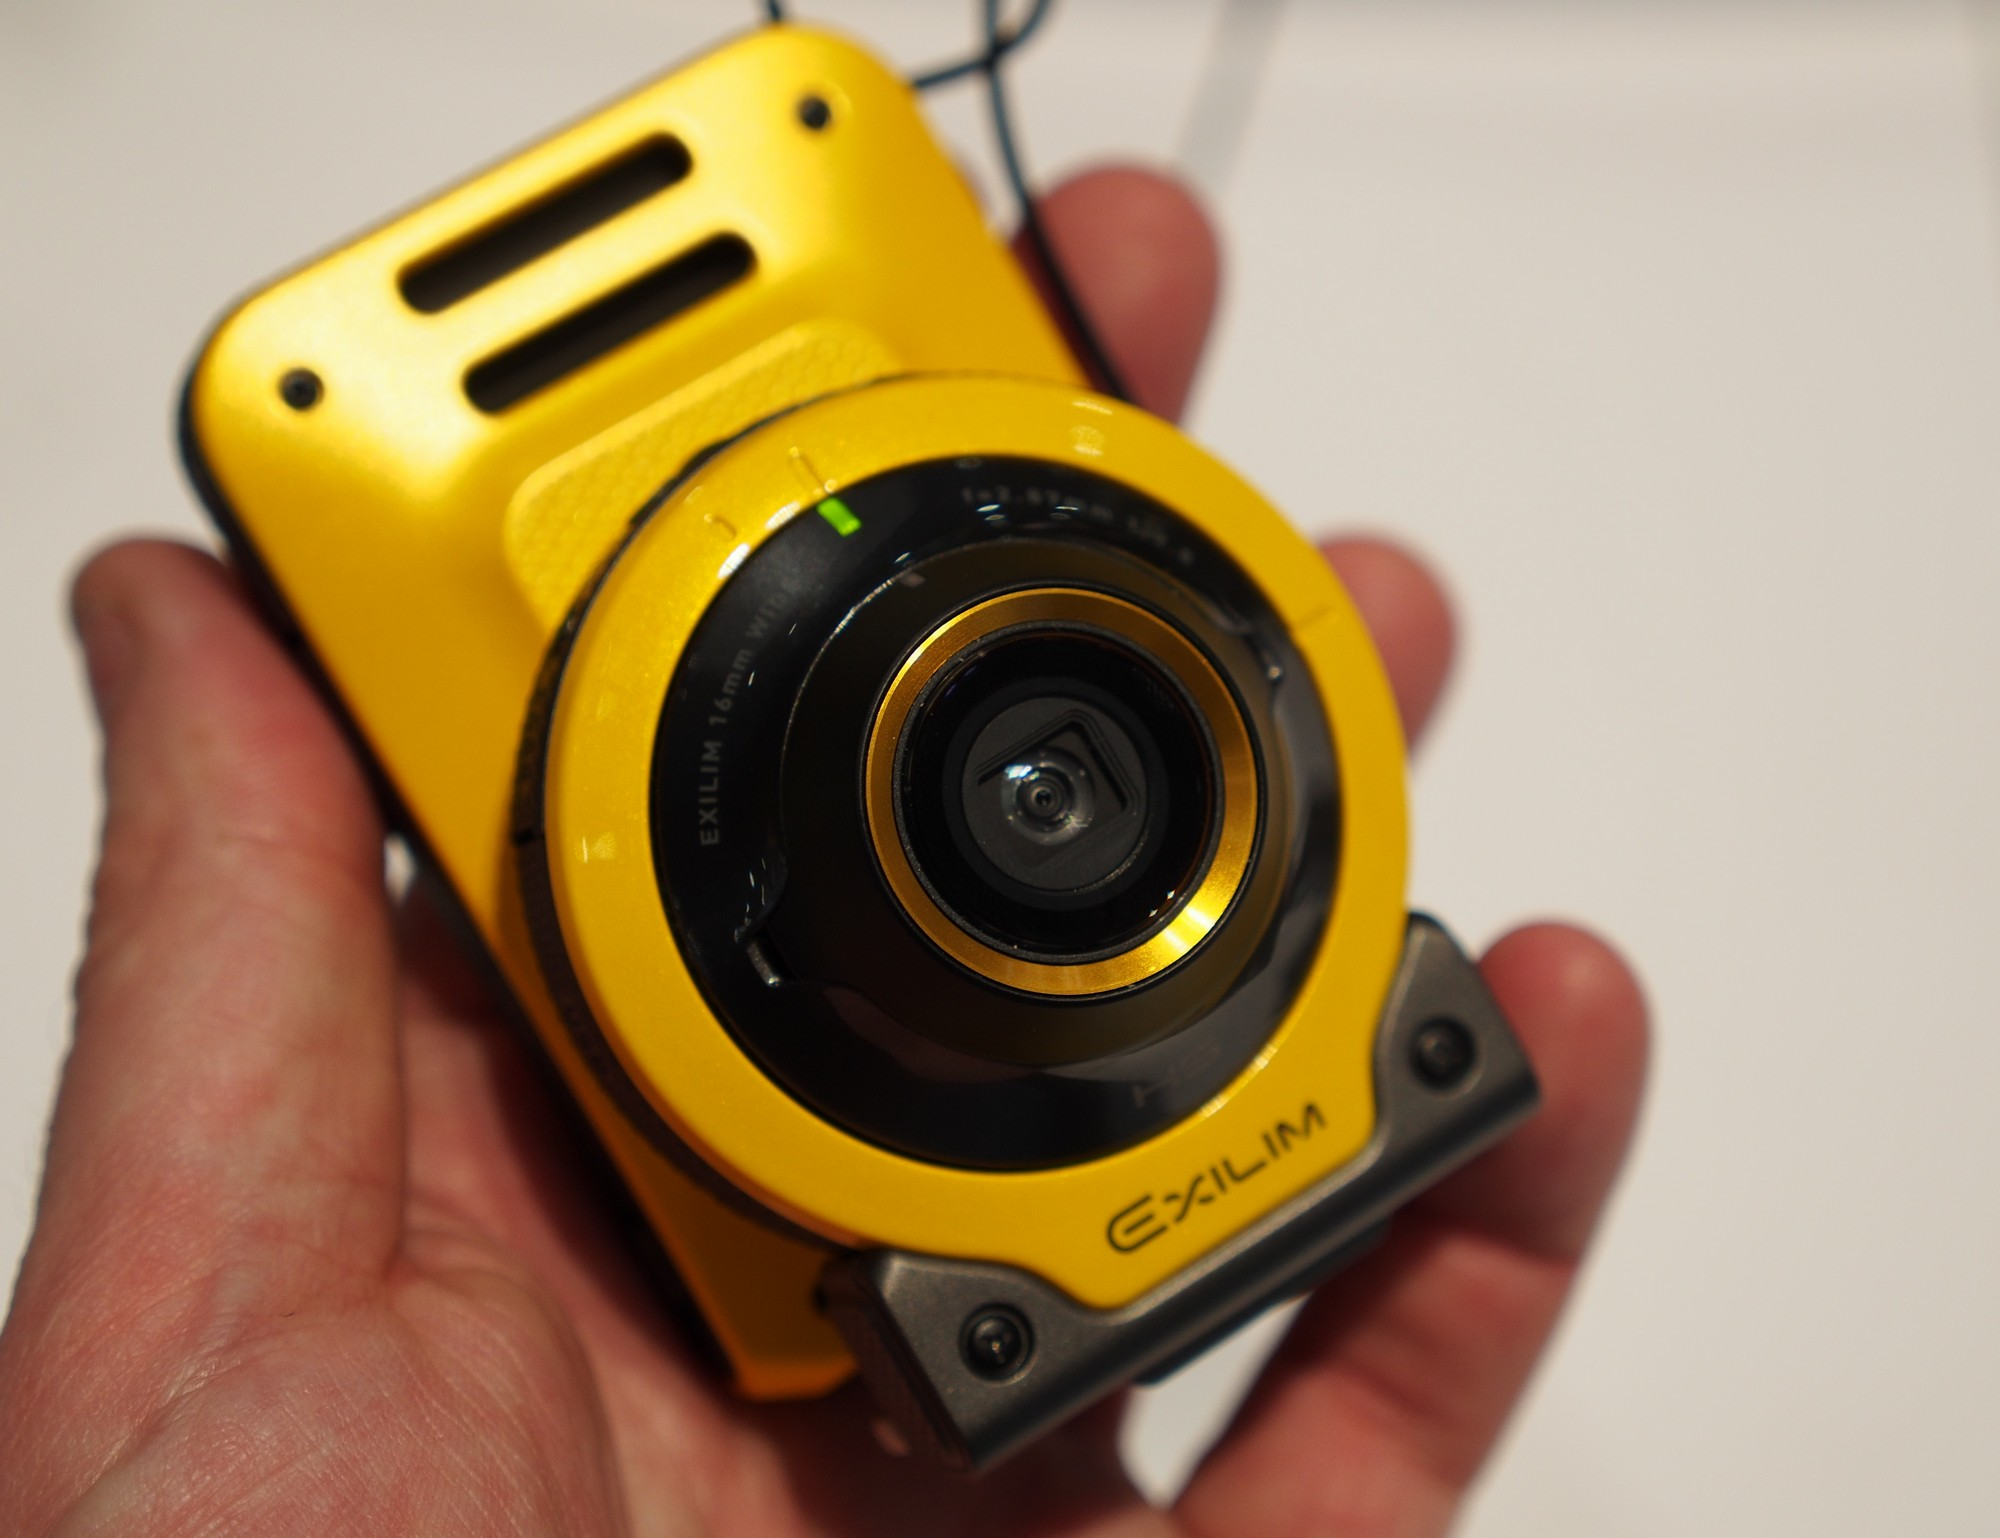 Casio Exilim EX FR100 - o noua camera robusta pentru selfie-uri